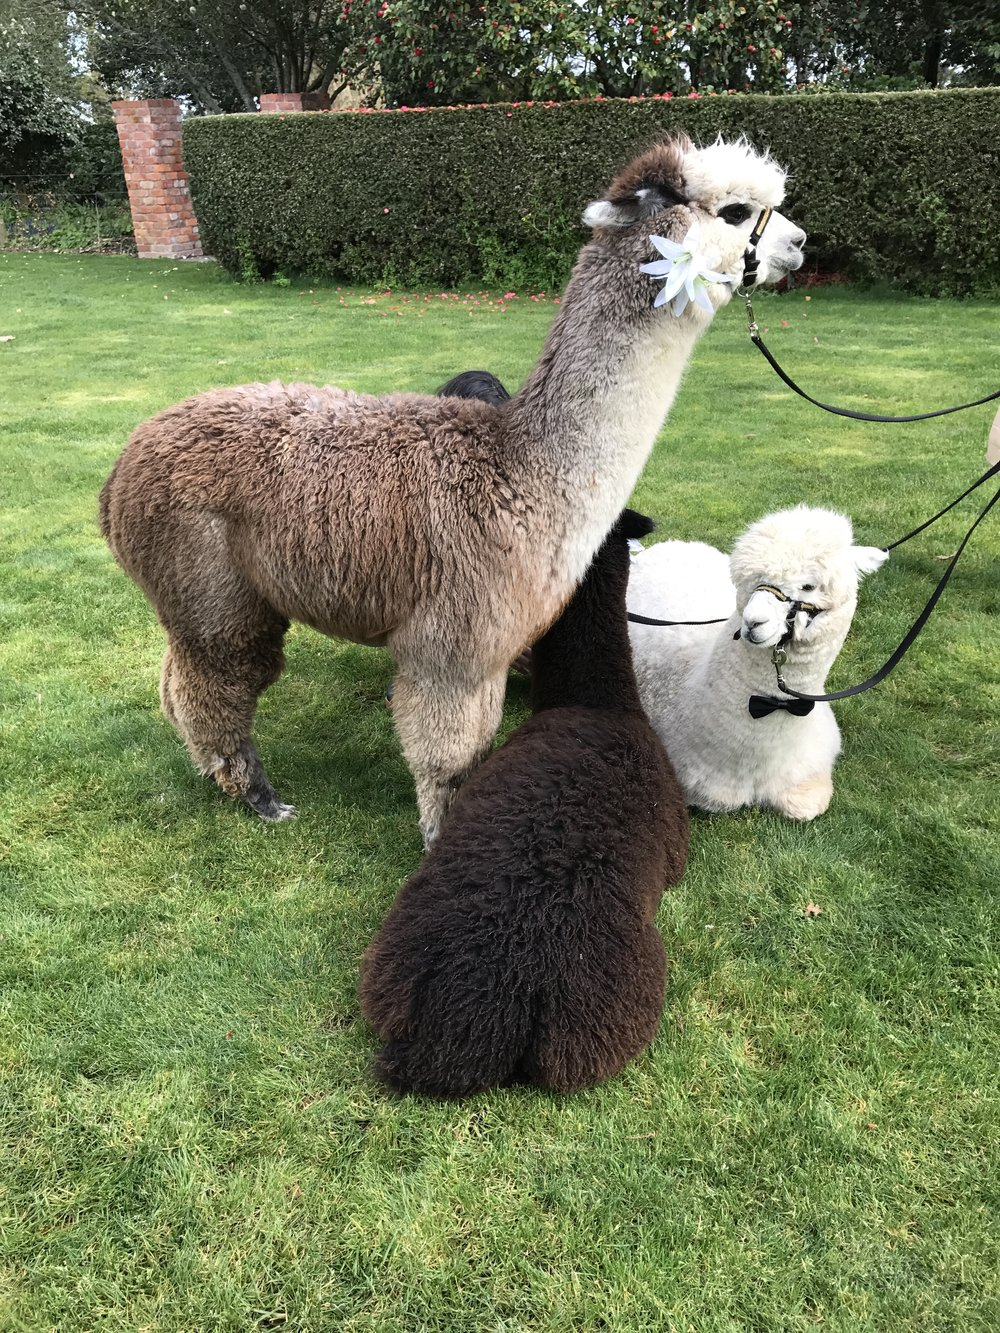 The alpacas were so cute and fluffy!